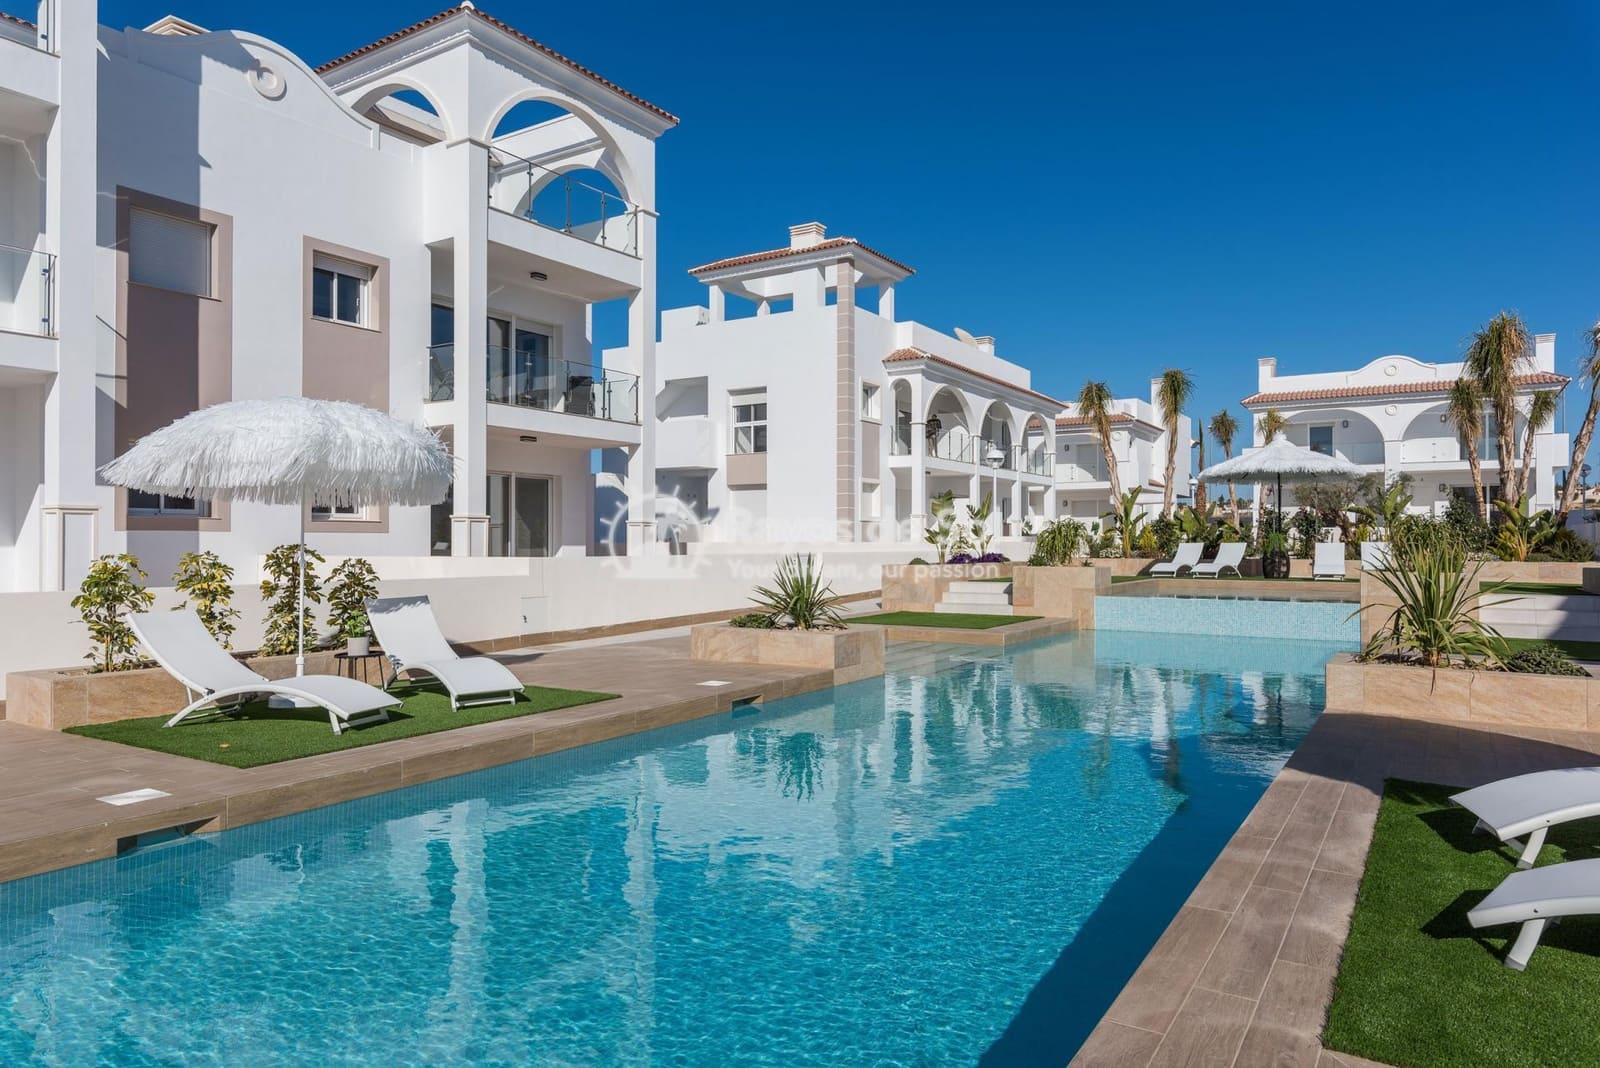 3 bedroom Apartment for sale in Ciudad Quesada with pool - € 286,550 (Ref: 5394977)